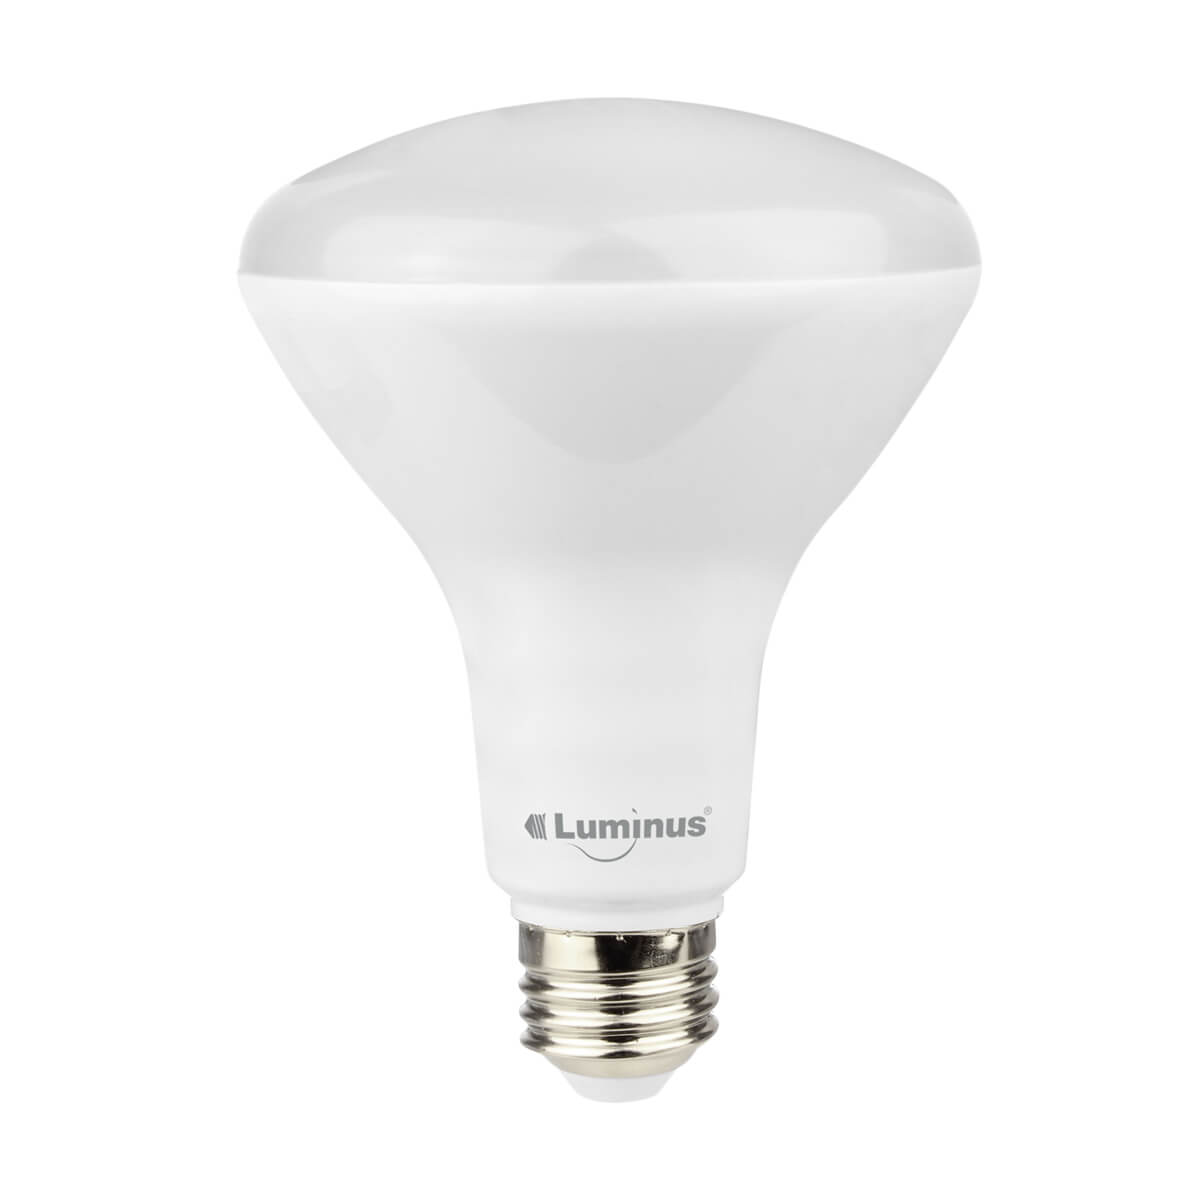 Luminus G5 LED 11W BR30 2700K